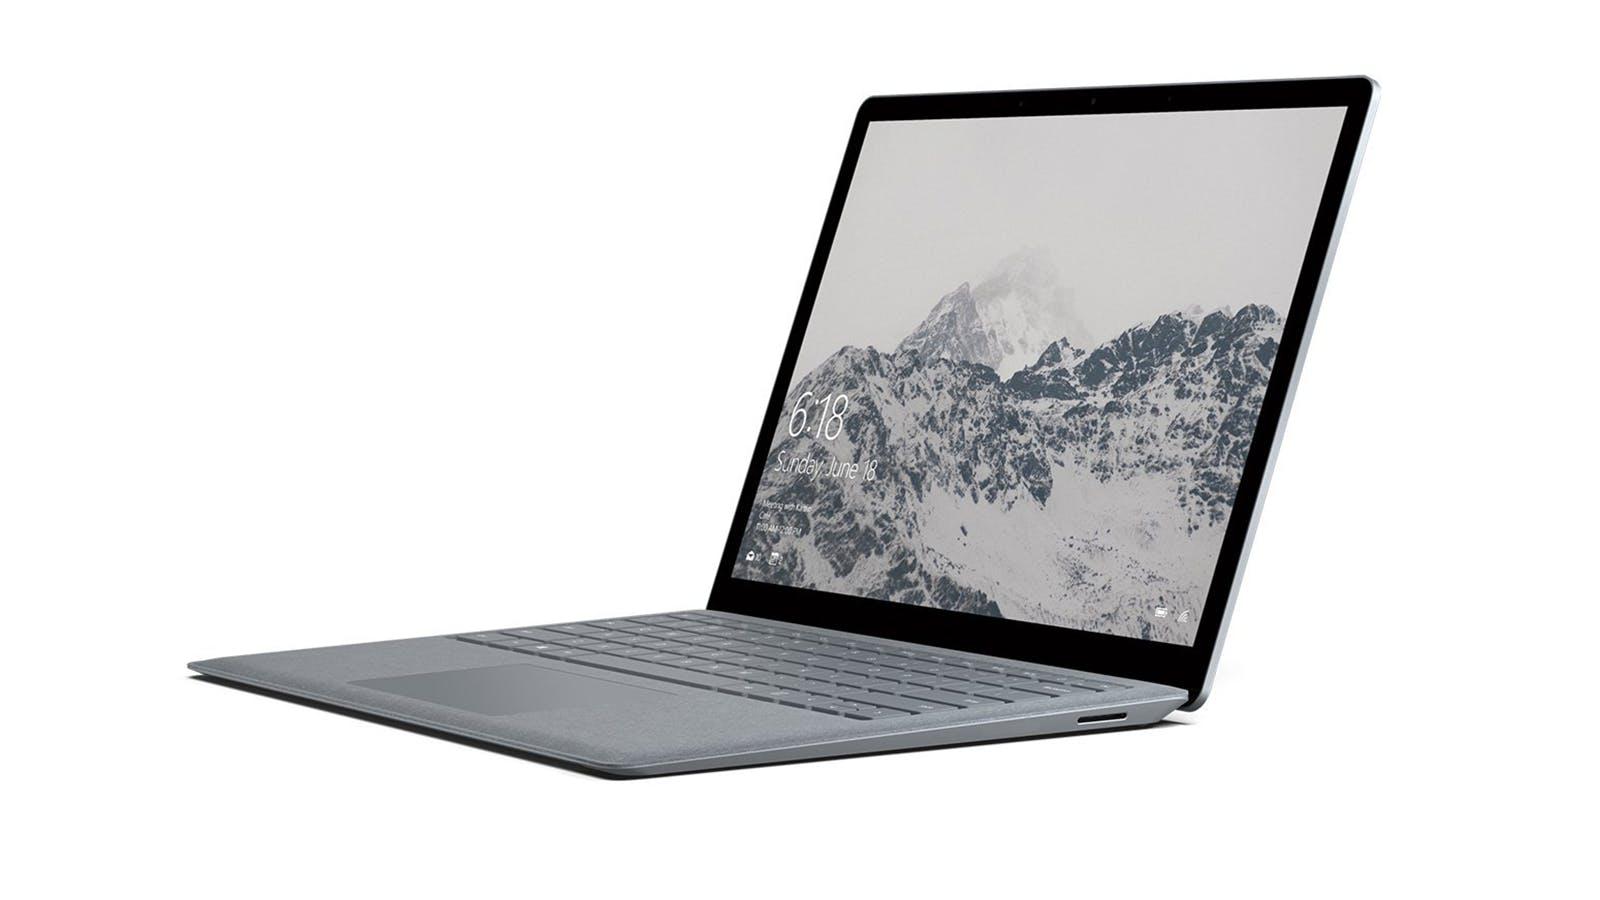 Home :: Computing :: Tablets :: Windows Tablets :: Microsoft Surface Laptop  - 256GB / Intel Core i7 - 8GB RAM